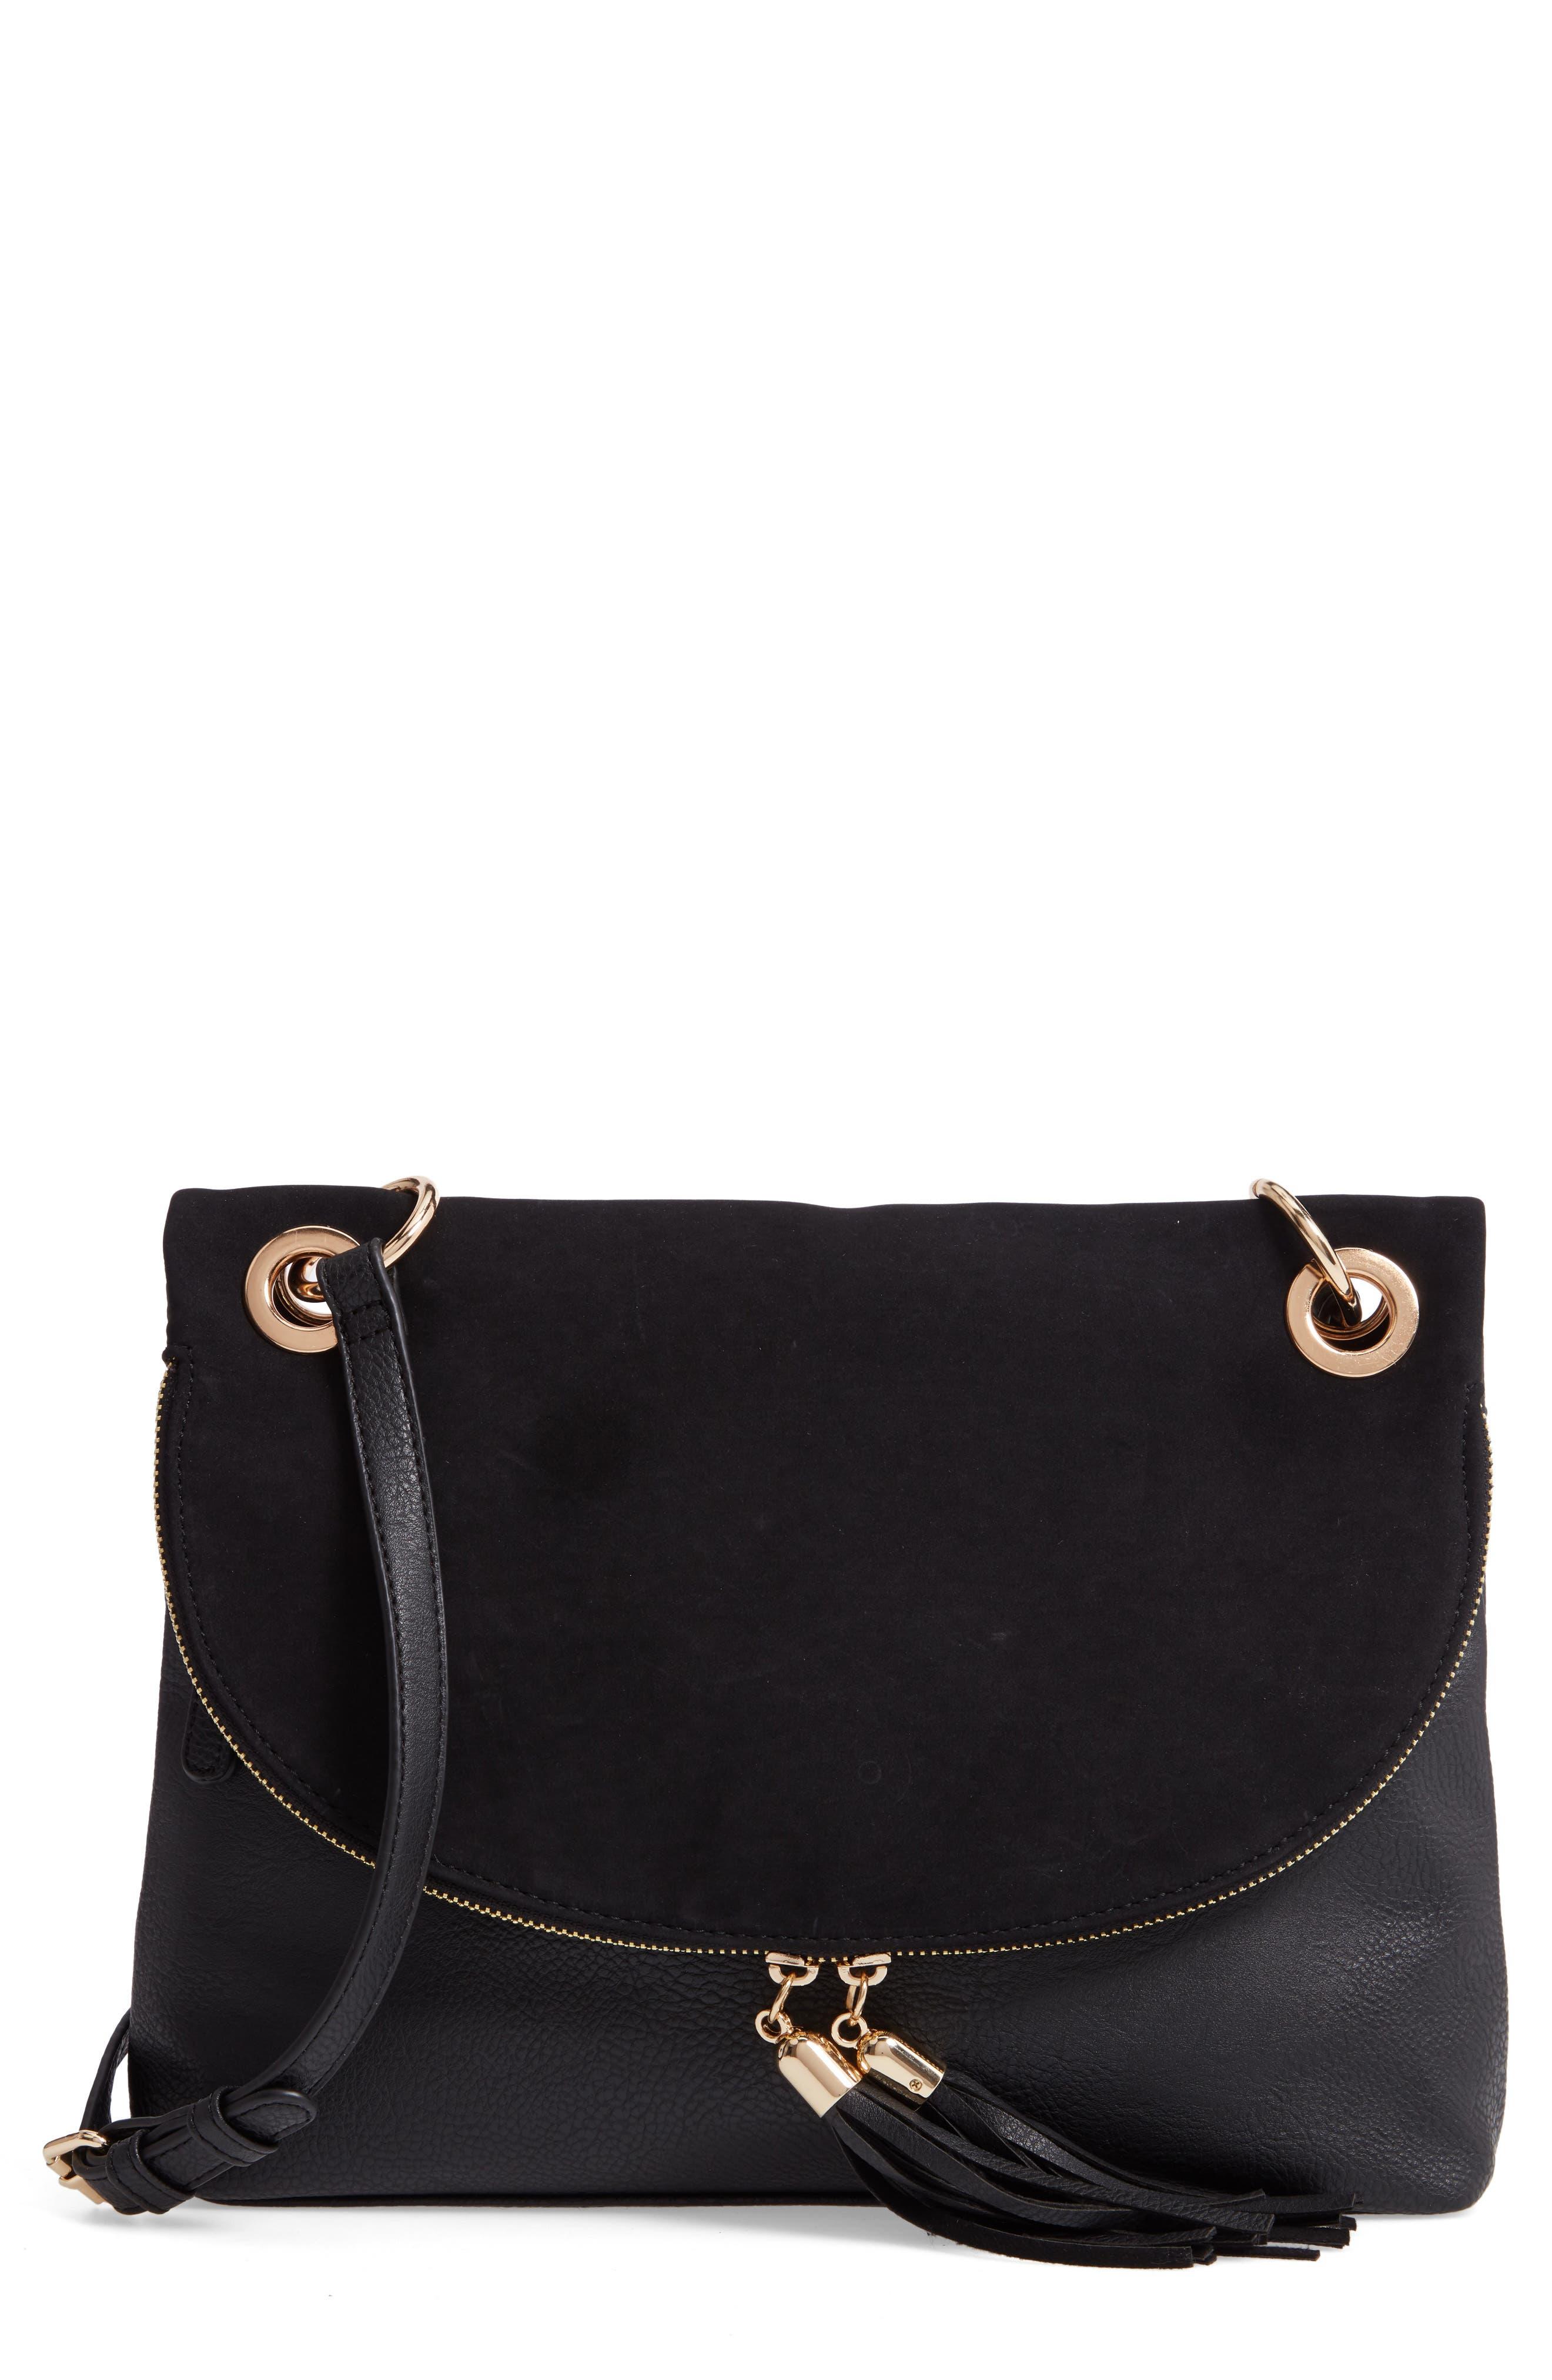 BP. Faux Leather Foldover Tassel Crossbody Bag, Main, color, 001